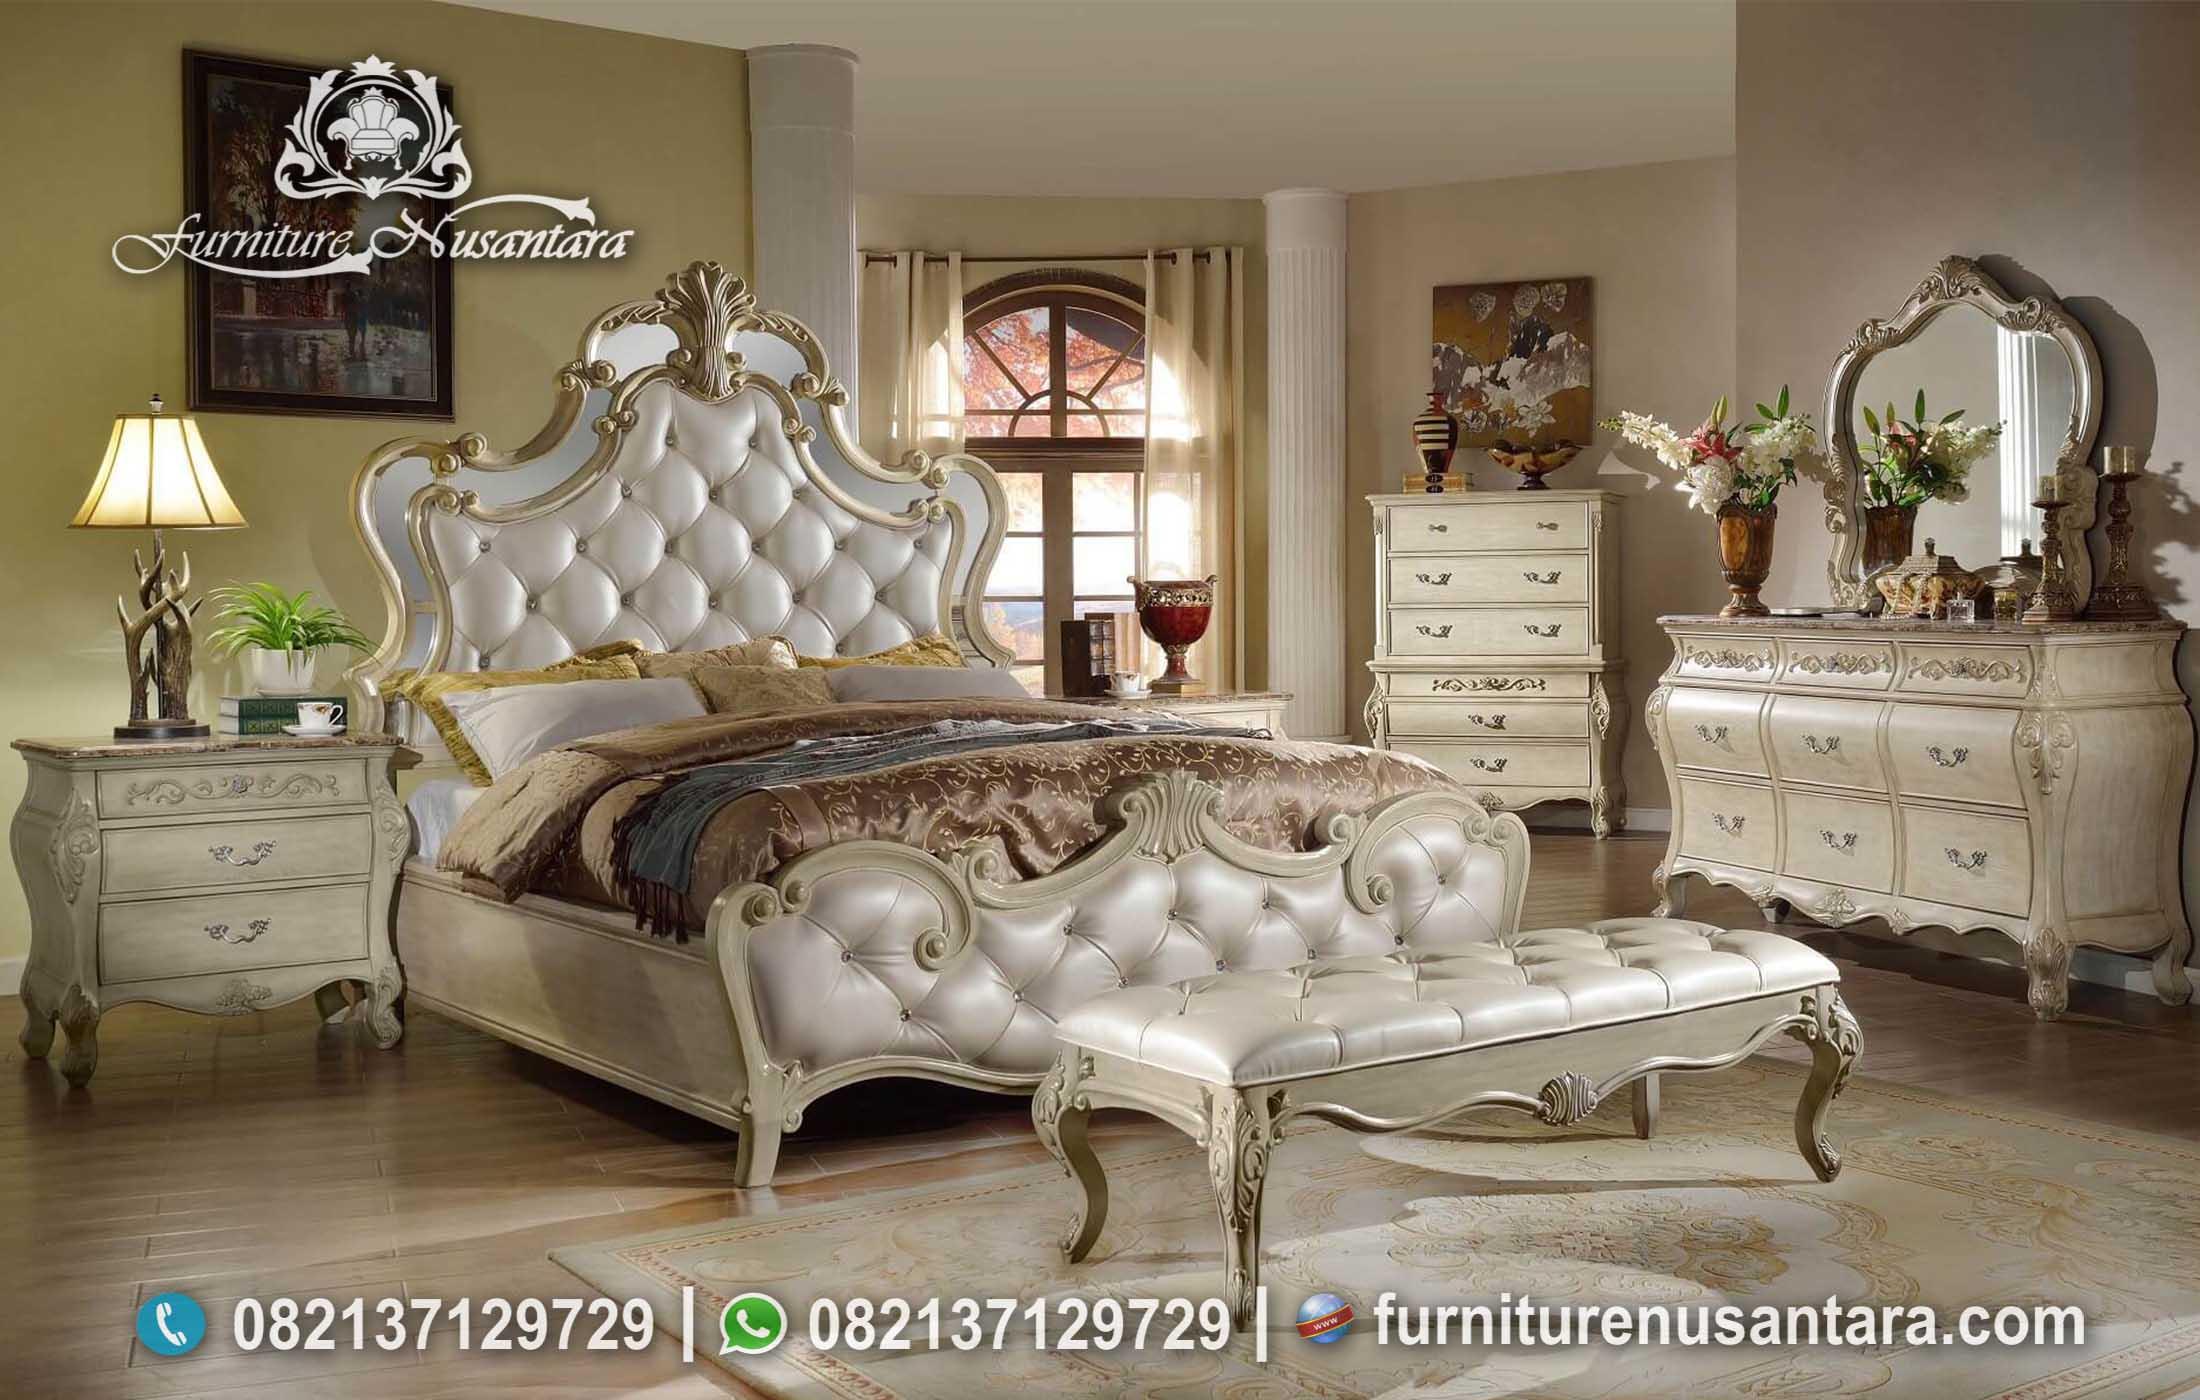 Jual Set Kamar Tidur Klasik Italian Leather KS-158, Furniture Nusantara